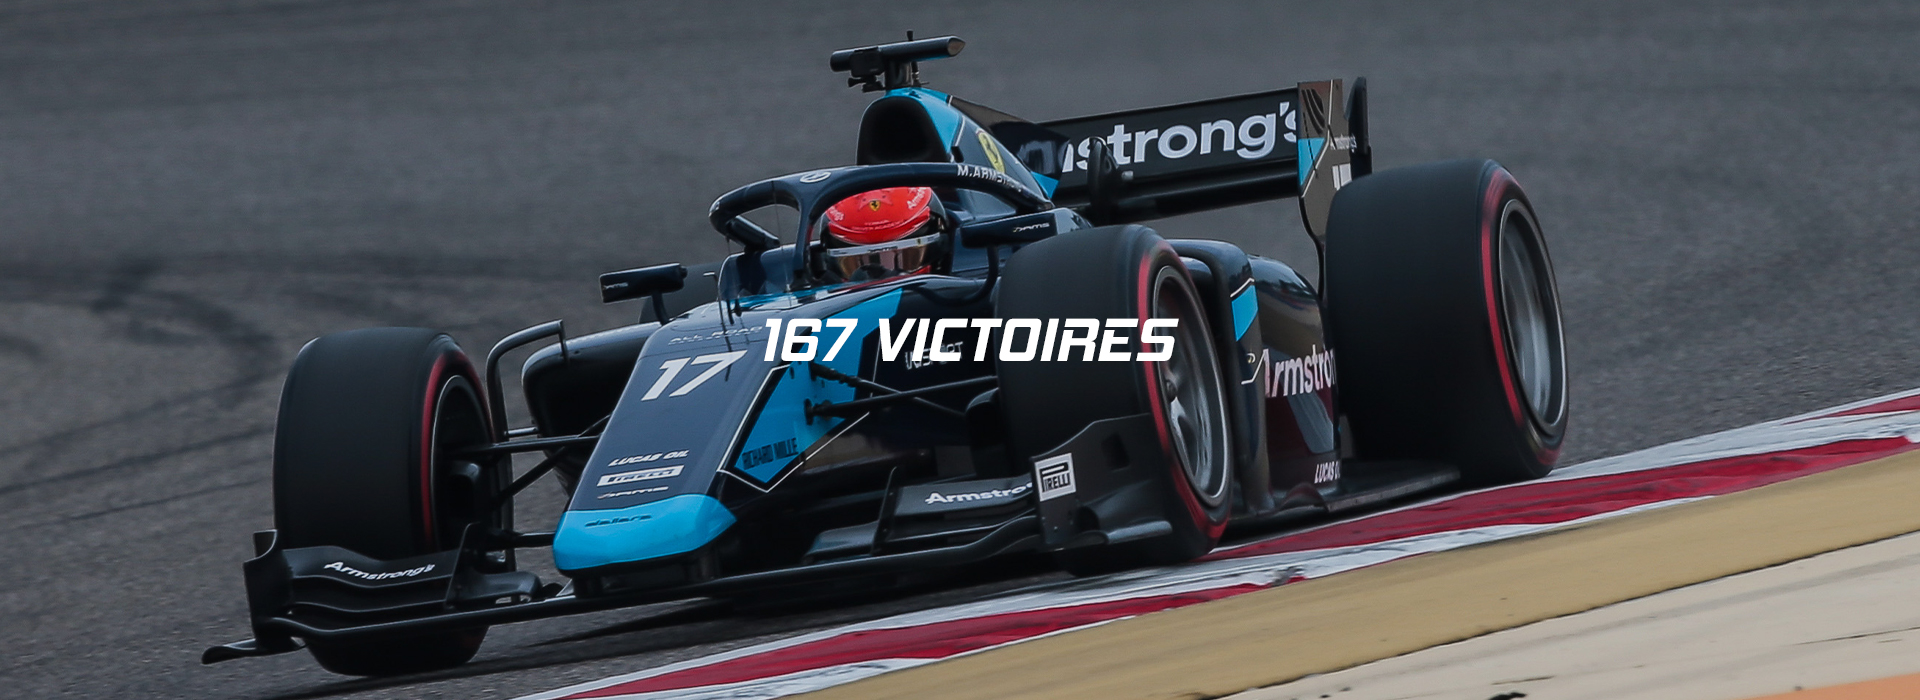 167 victoires